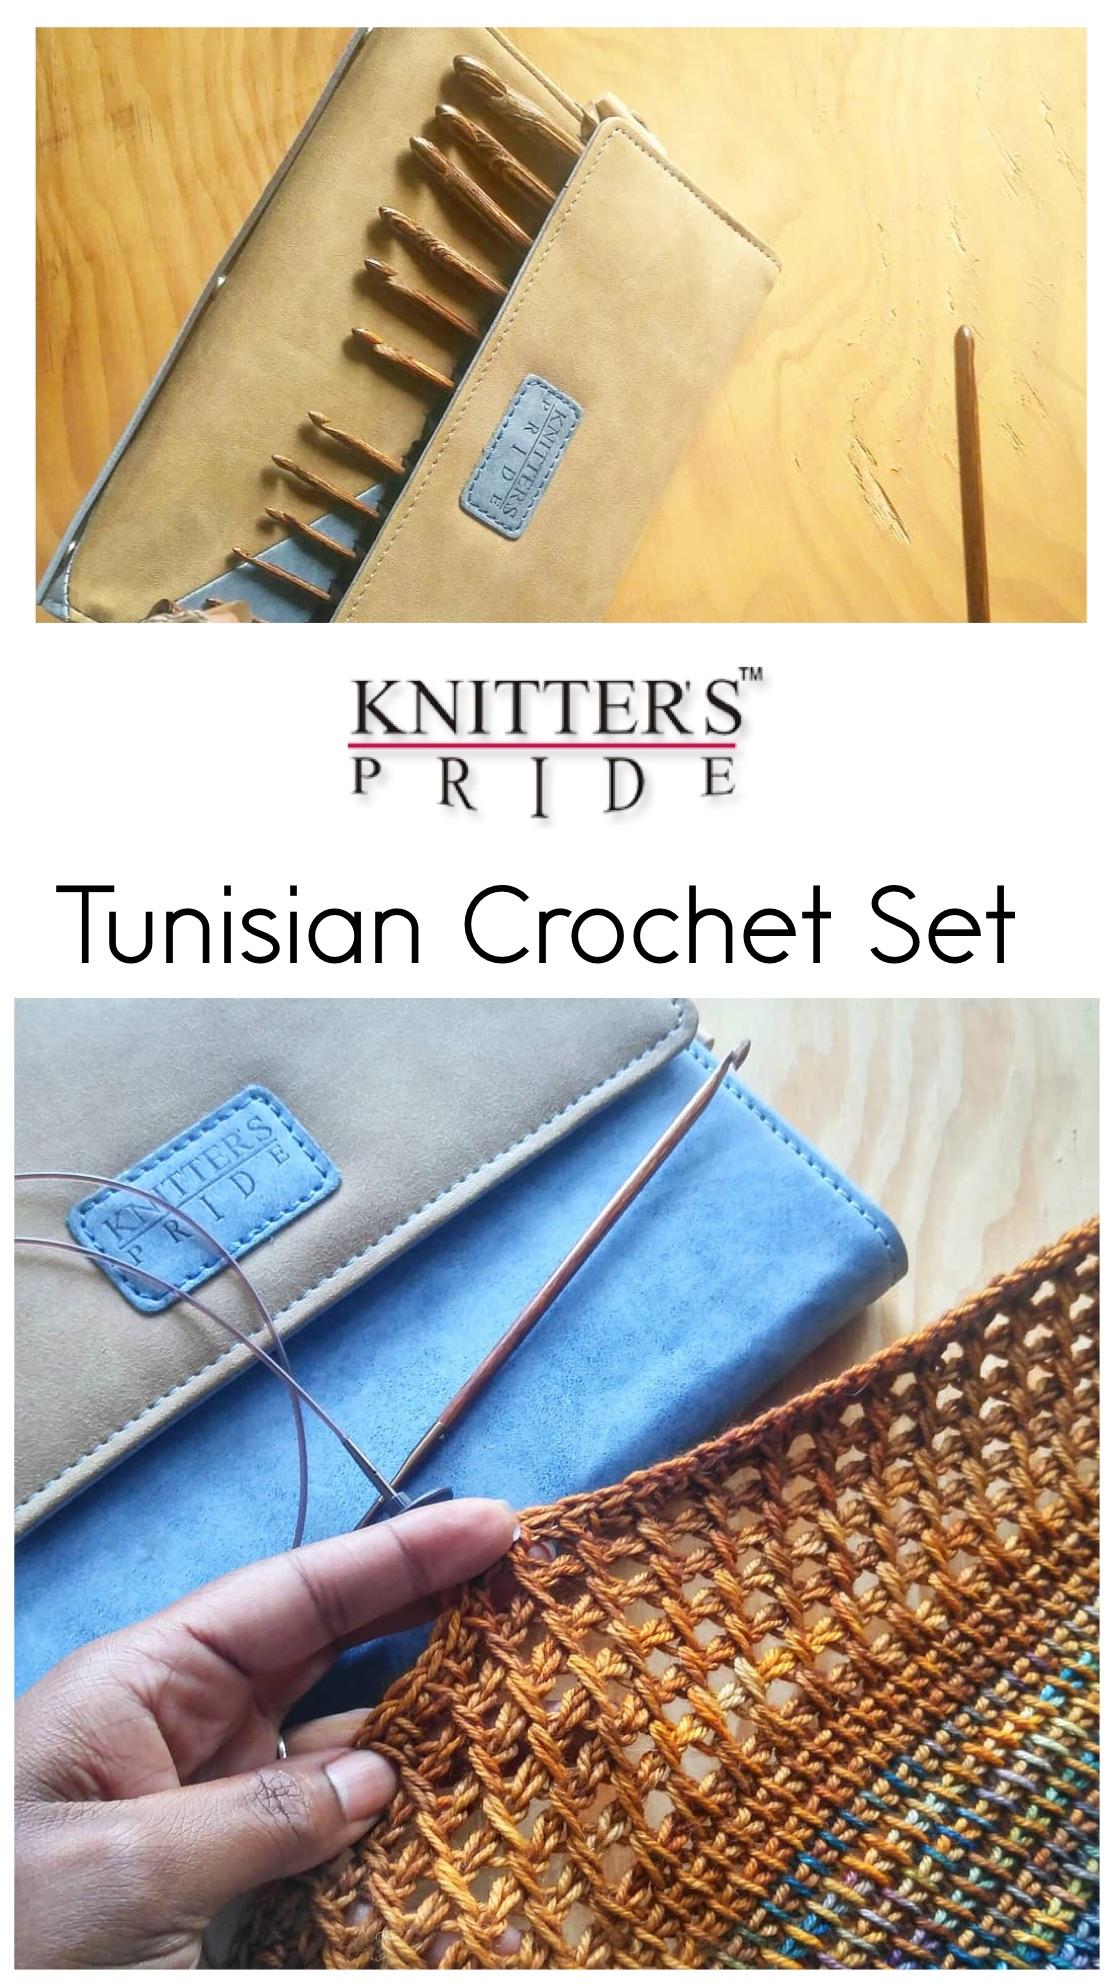 KnittersPride_TunisianCrochetHook_Review3.jpg